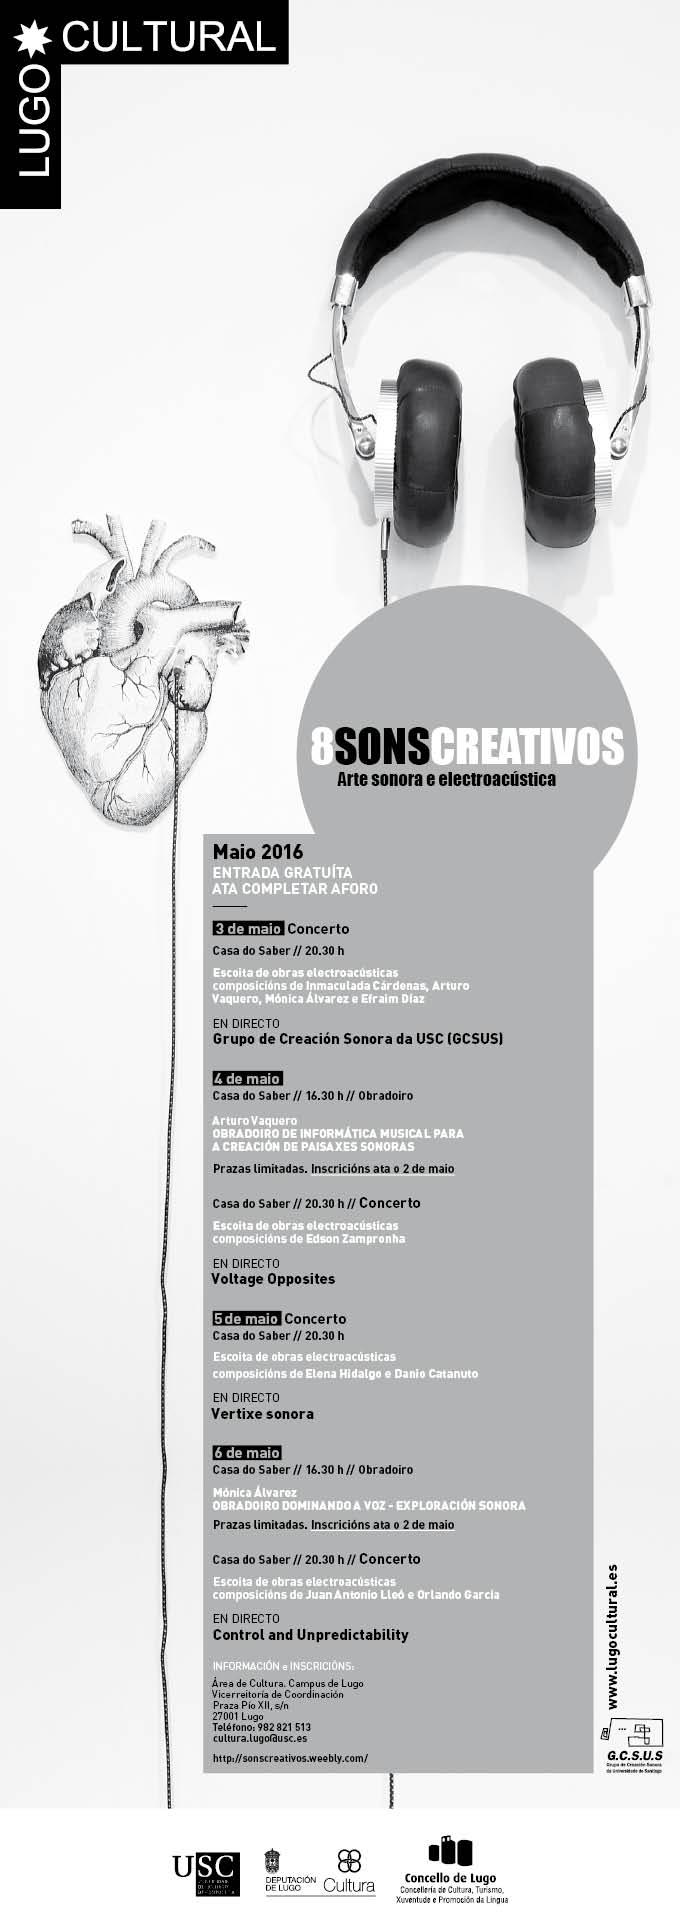 8 Sons Creativos 2016